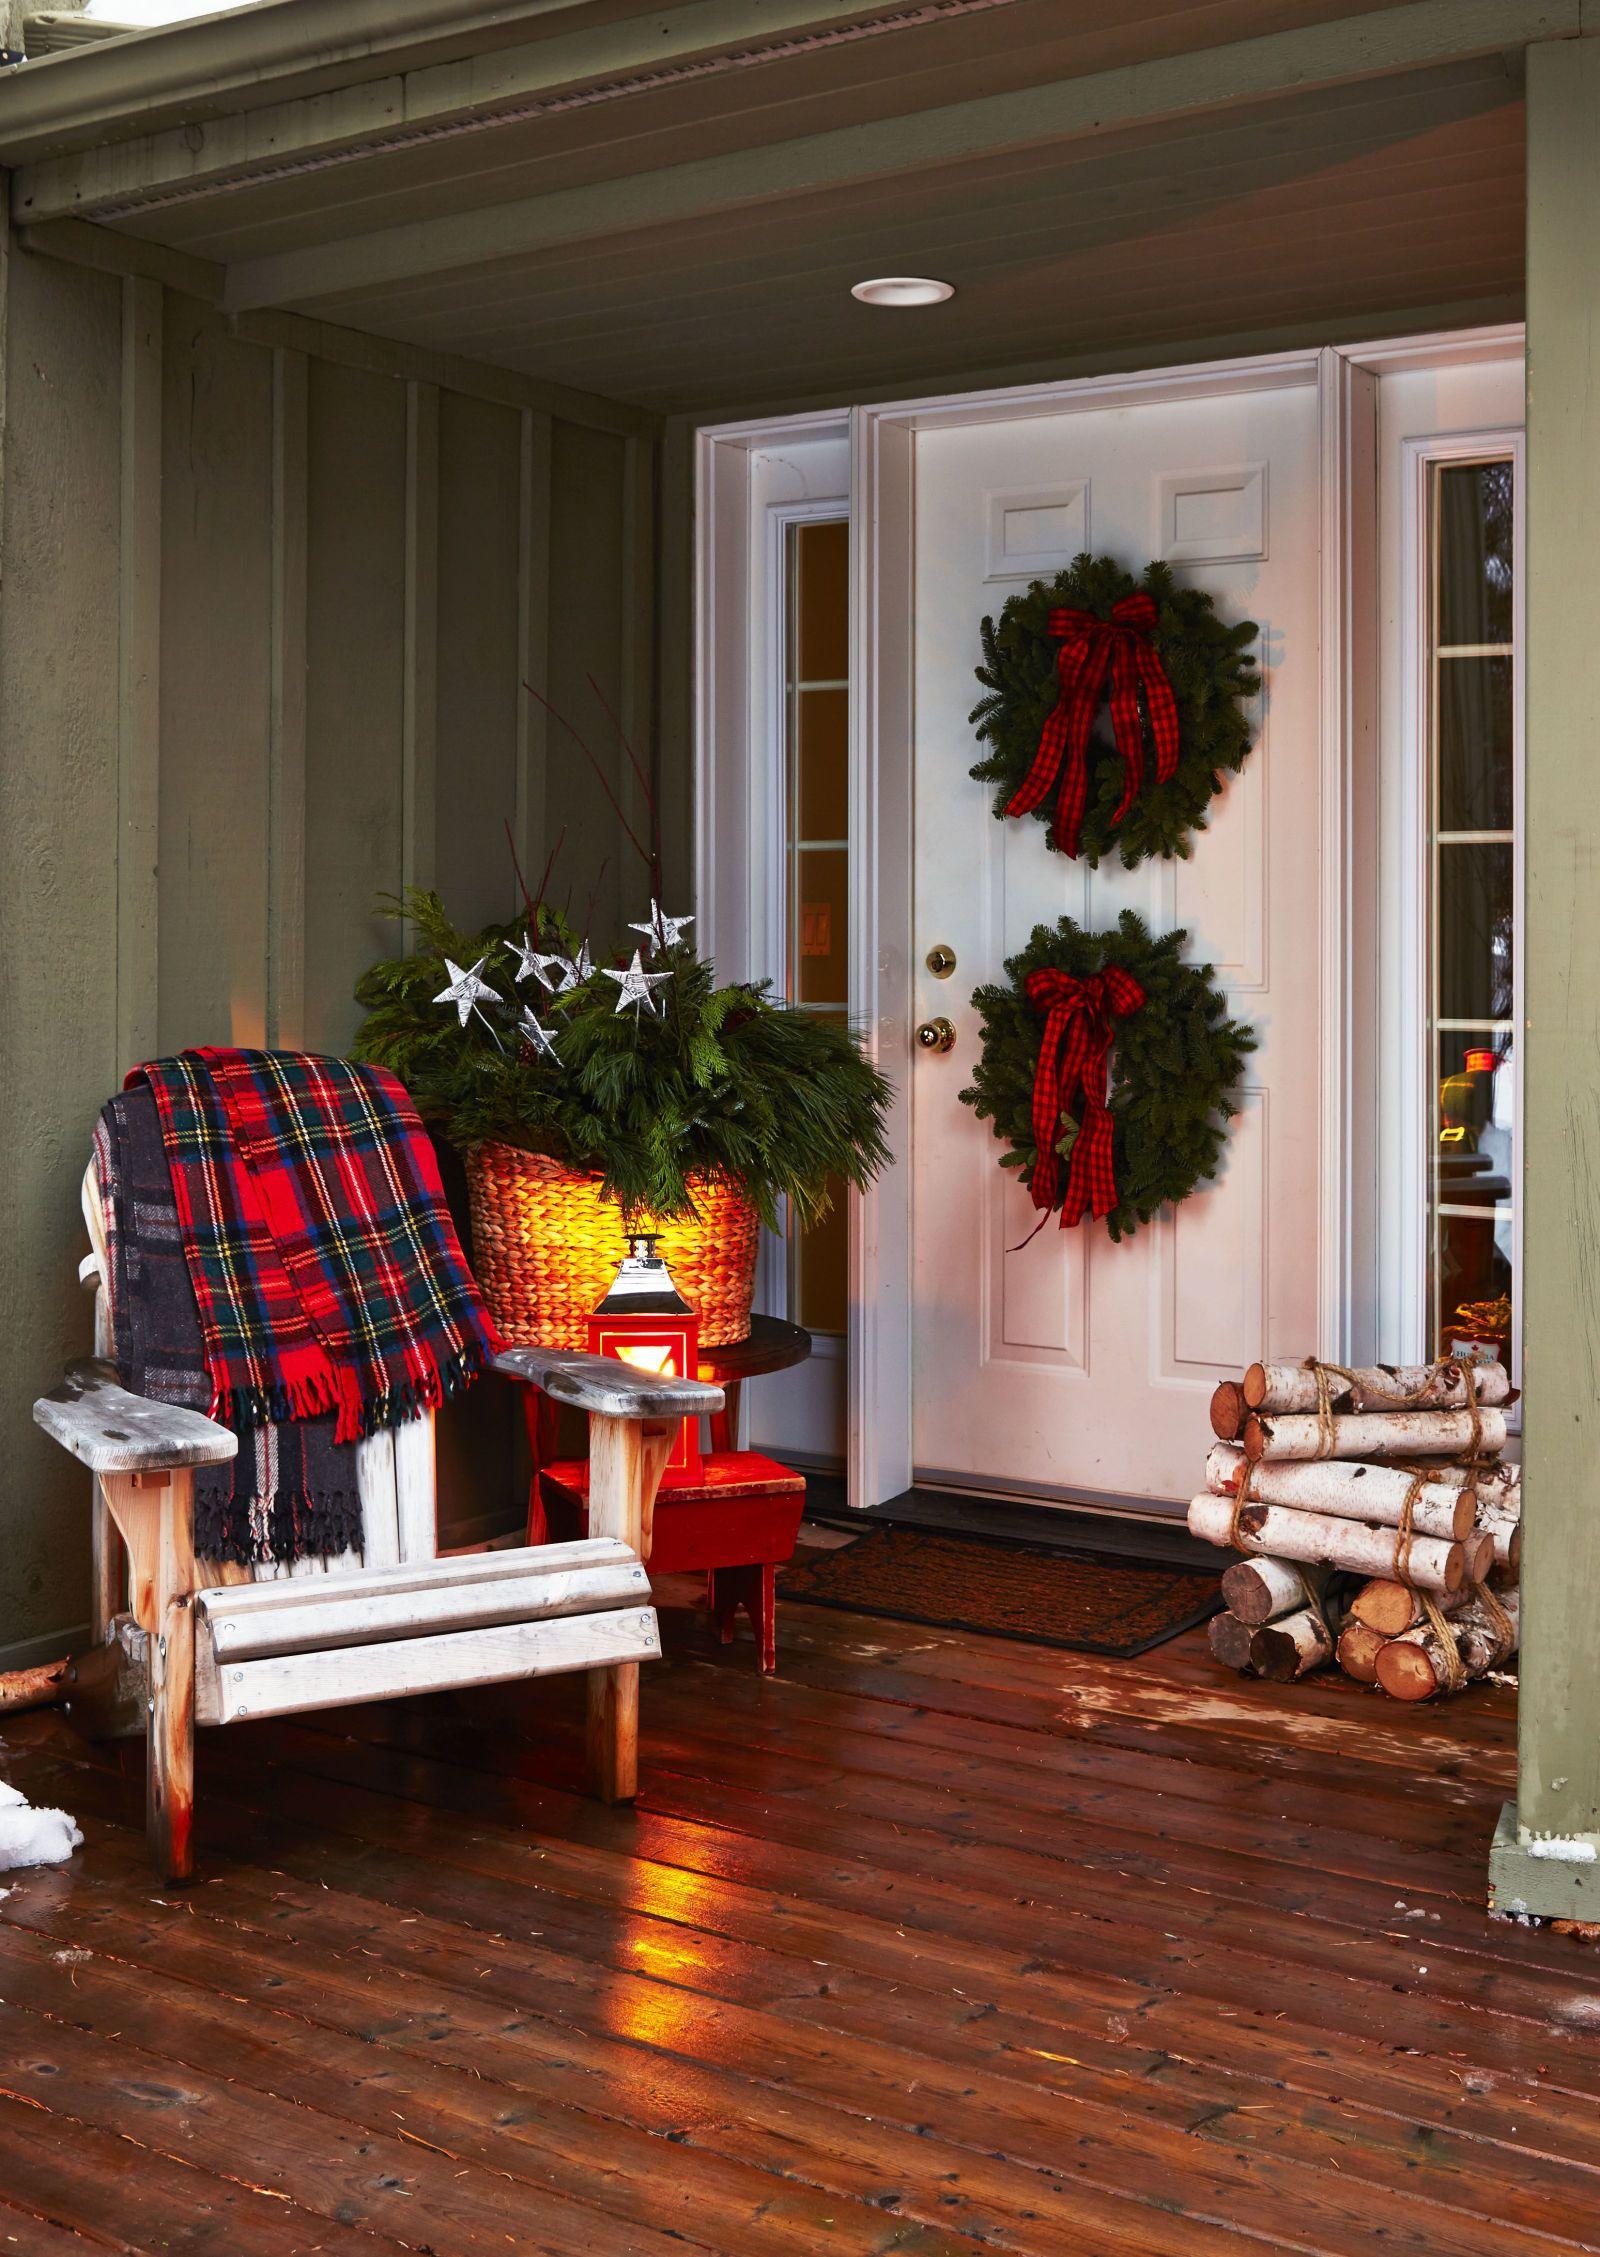 image & 50 Christmas Home Decorating Ideas - Beautiful Christmas Decorations